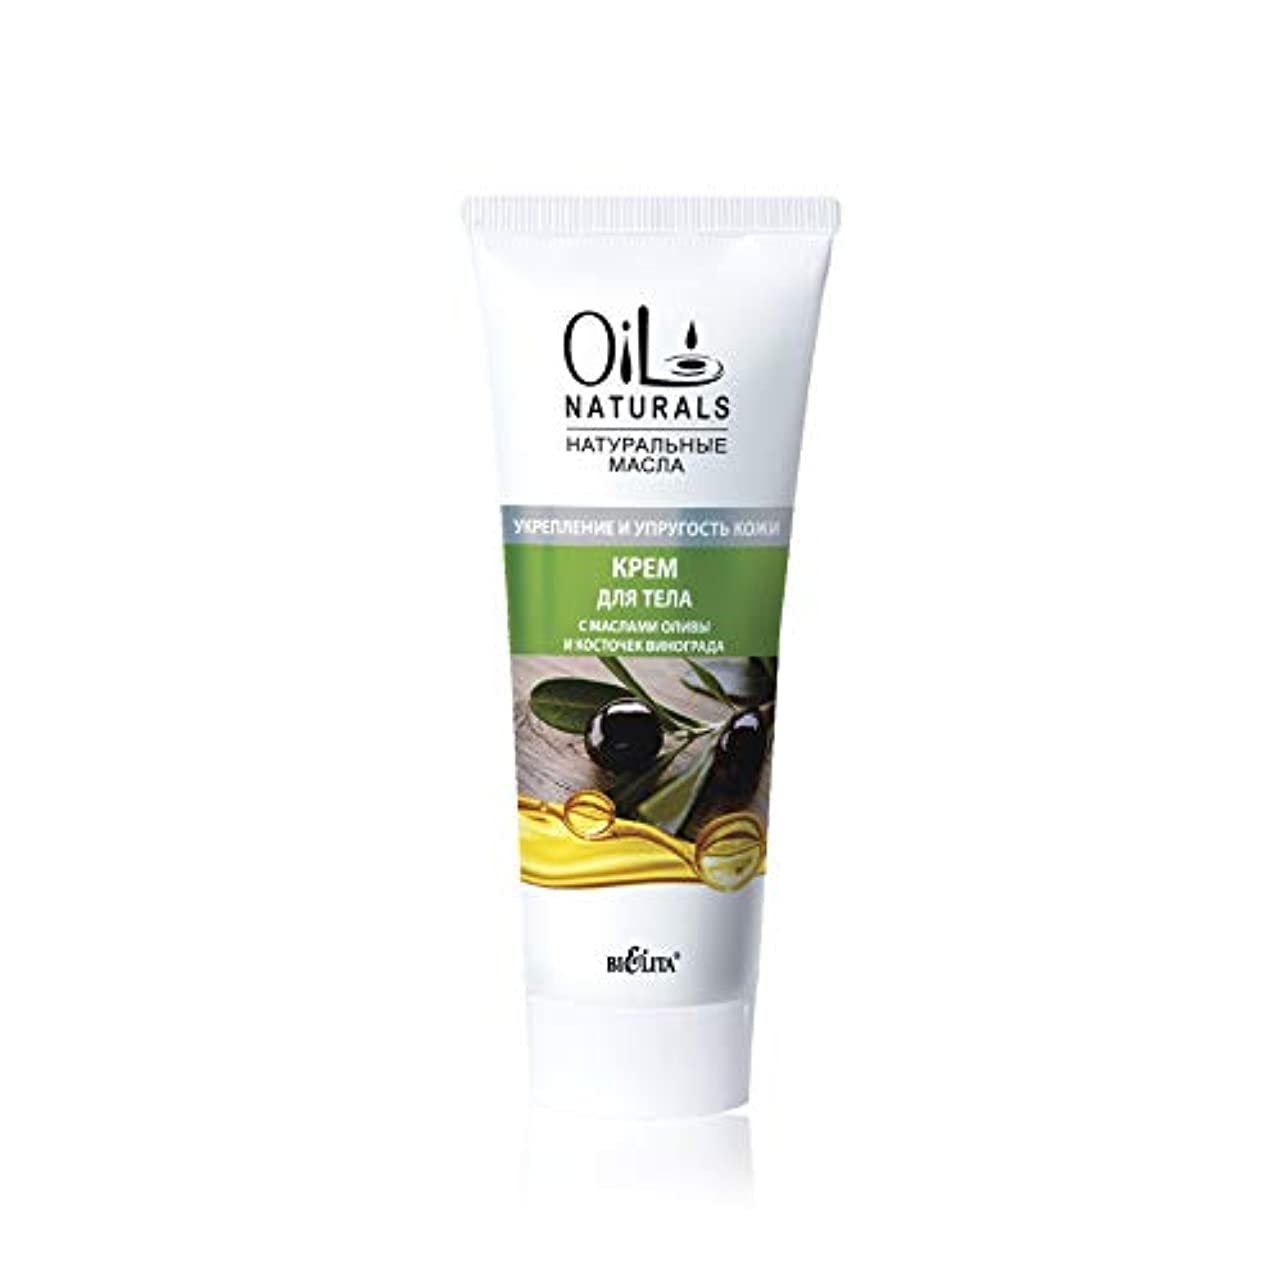 最終的に家庭教師降伏Bielita & Vitex | Oil Naturals Line | Skin Firming & Moisturizing Body Cream, 200 ml | Olive Oil, Silk Proteins...